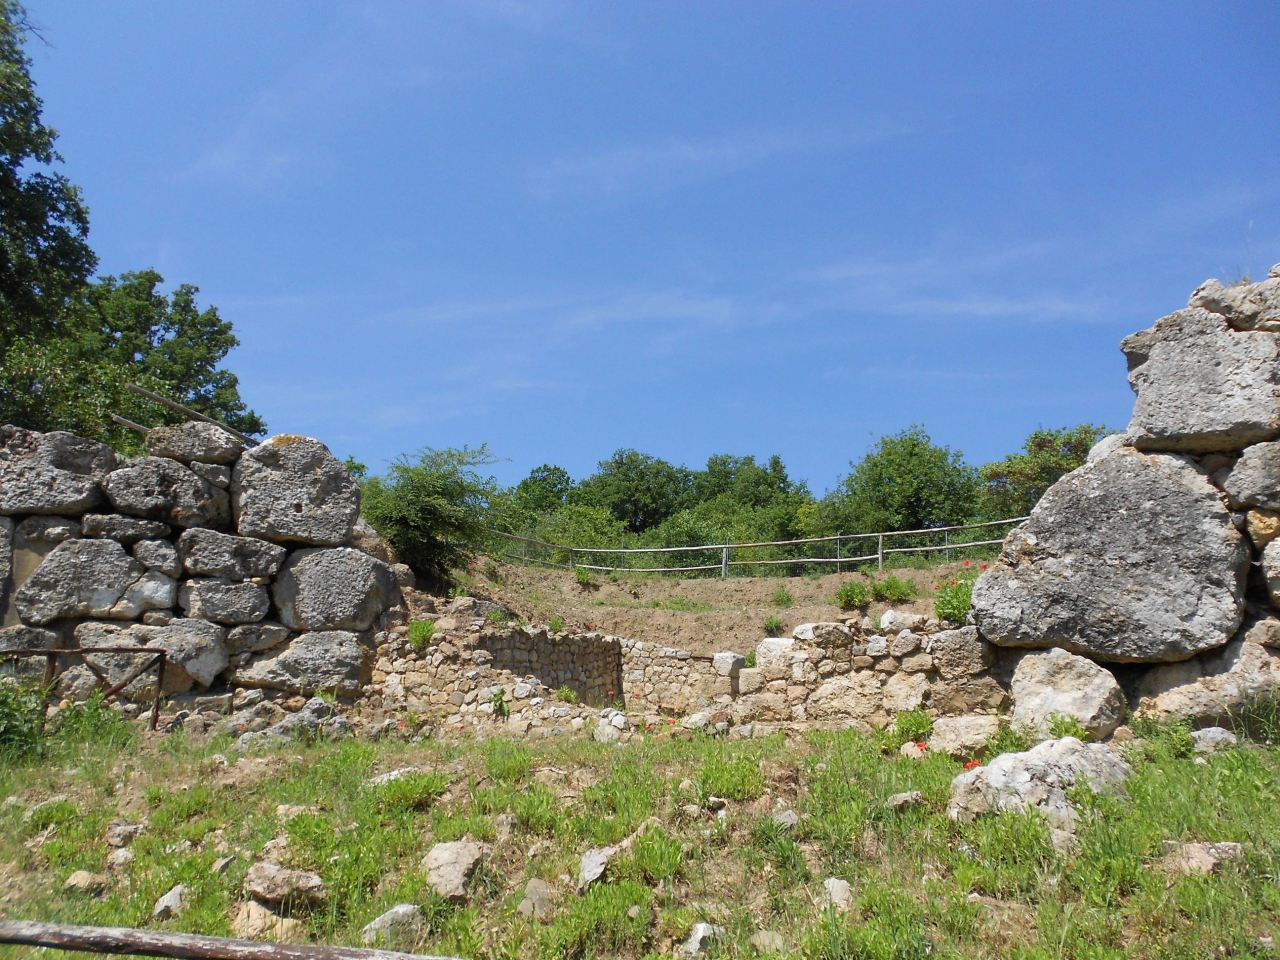 Roselle-Mura-Megalitiche-Roselle-Grosseto-Toscana-Italia-40